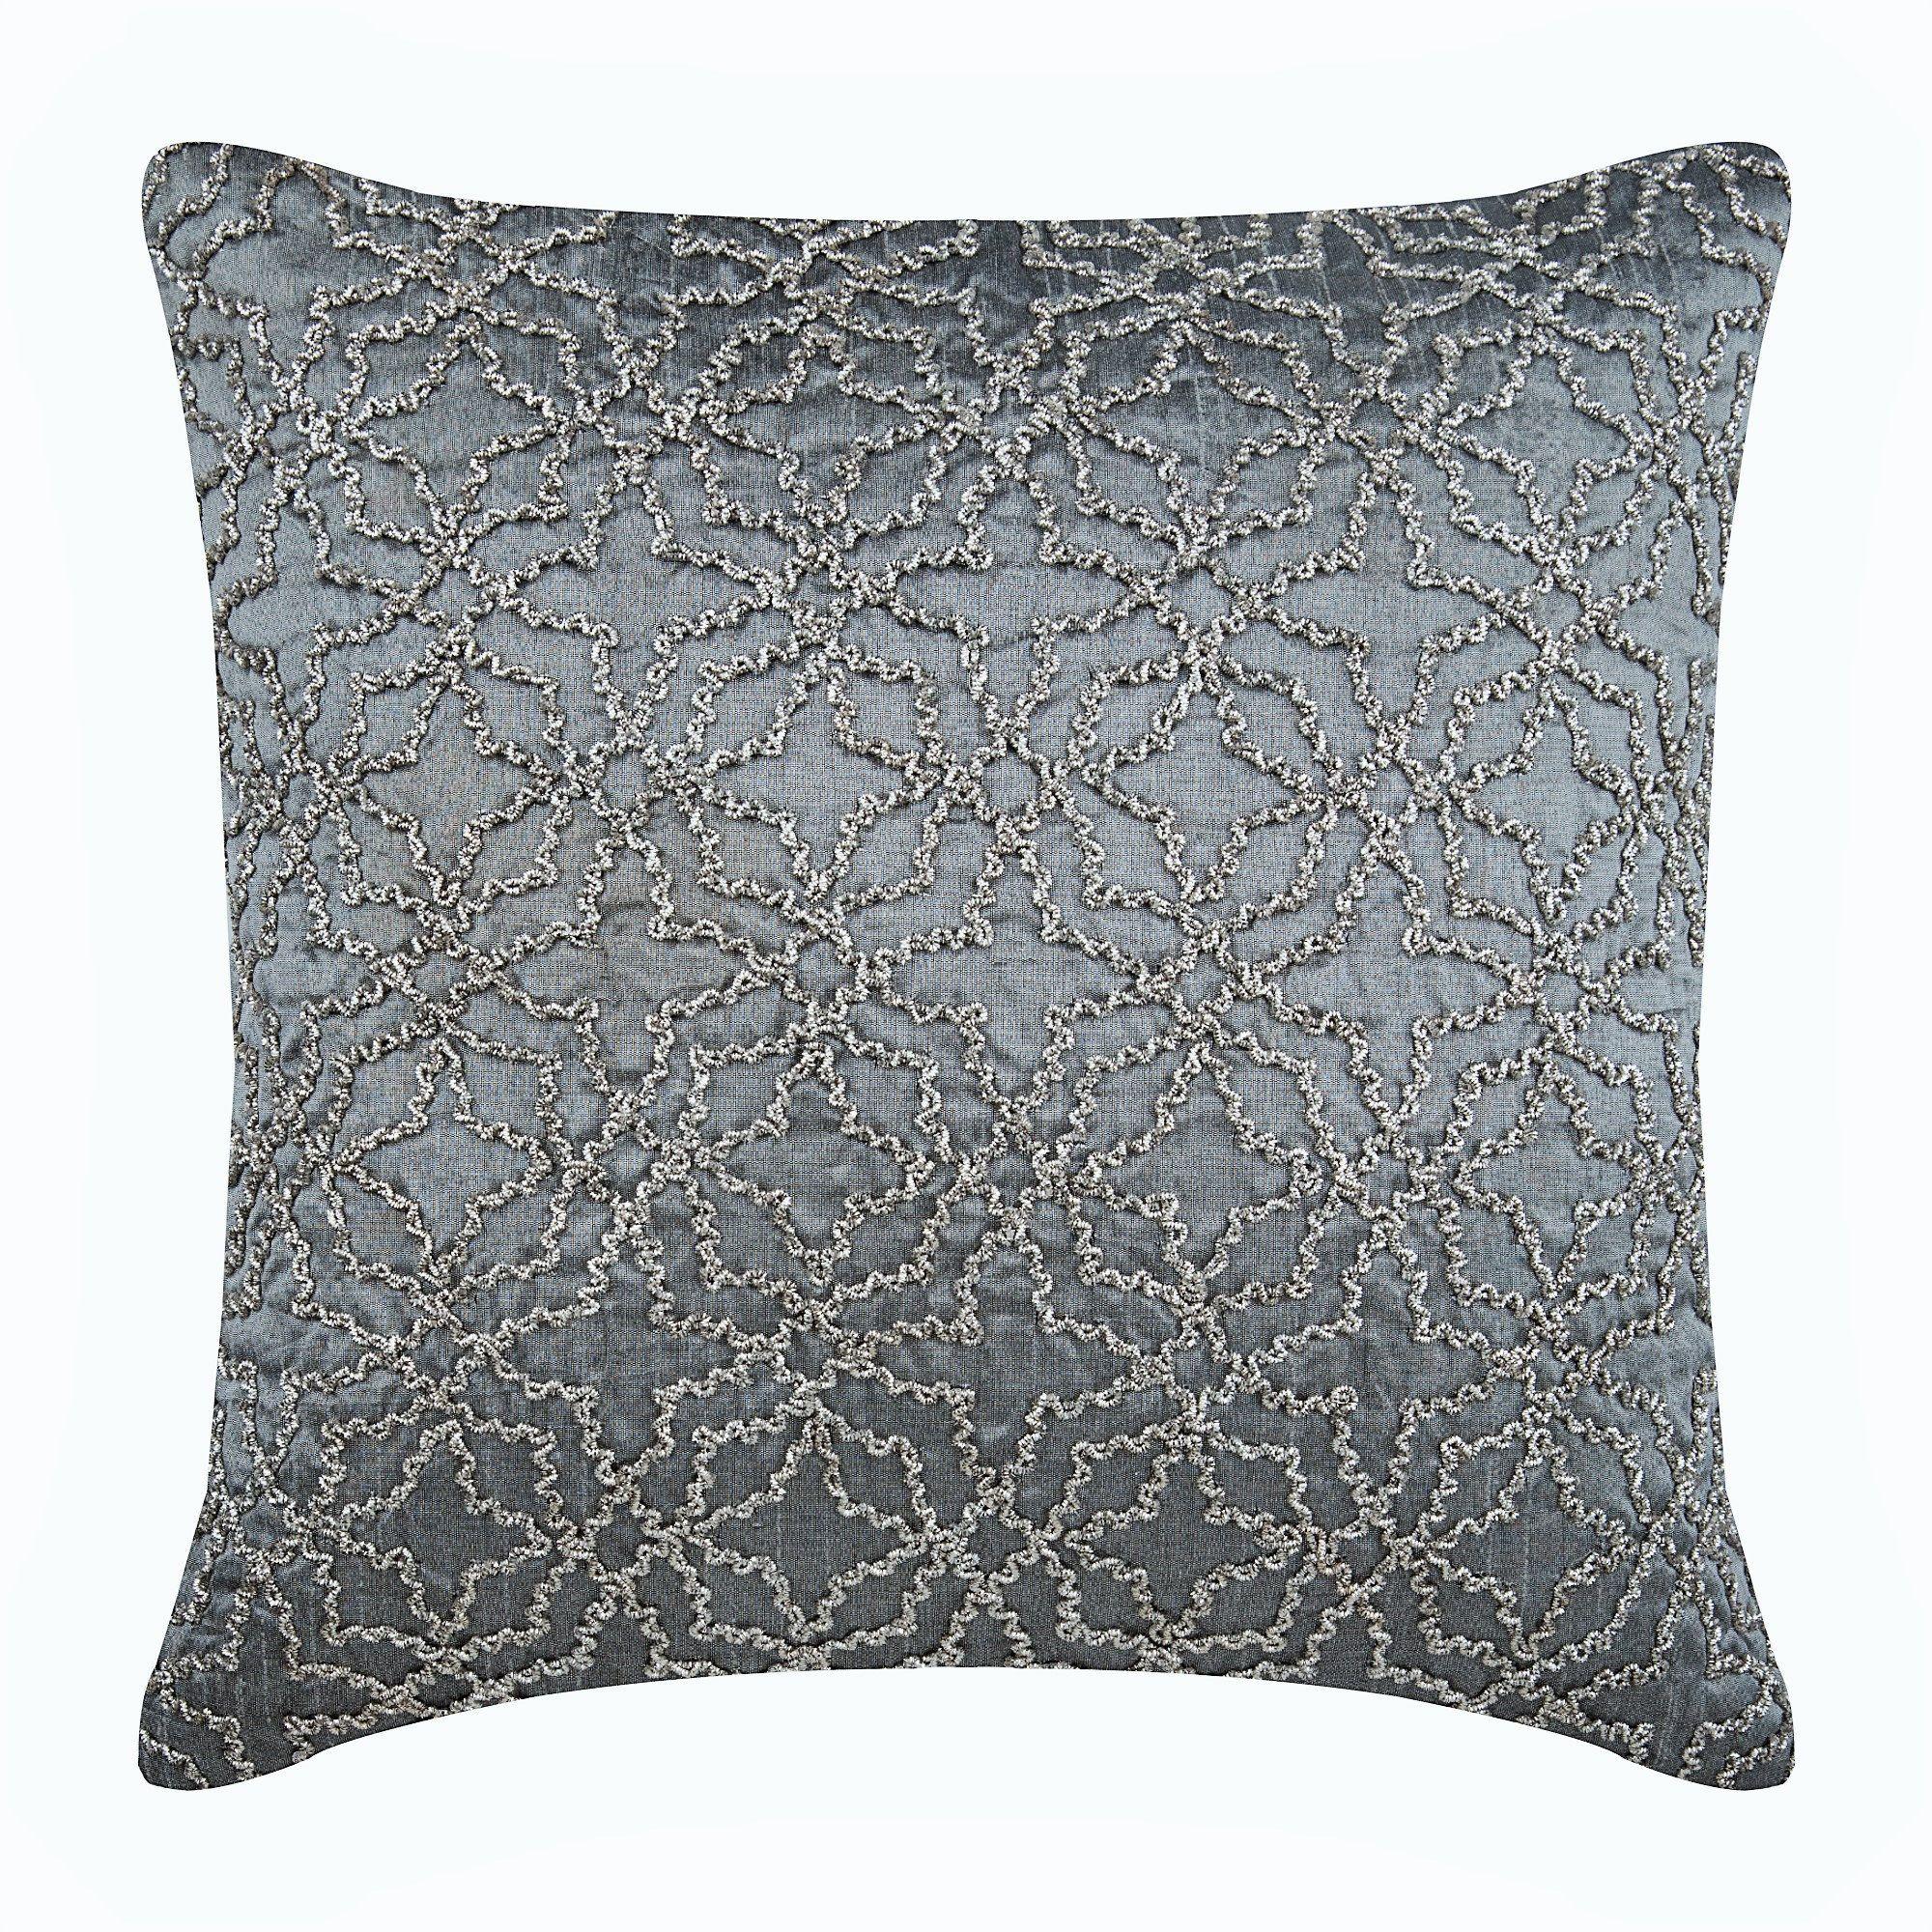 Decorative Lattice Trellis Pillow For Sofa 16 X16 Silk Sofa Cushion Cover Gray Toss Pillows Geometric Contemporary Spins On A Dime Silk Throw Pillows Decorative Throw Pillow Covers Silver Throw Pillows